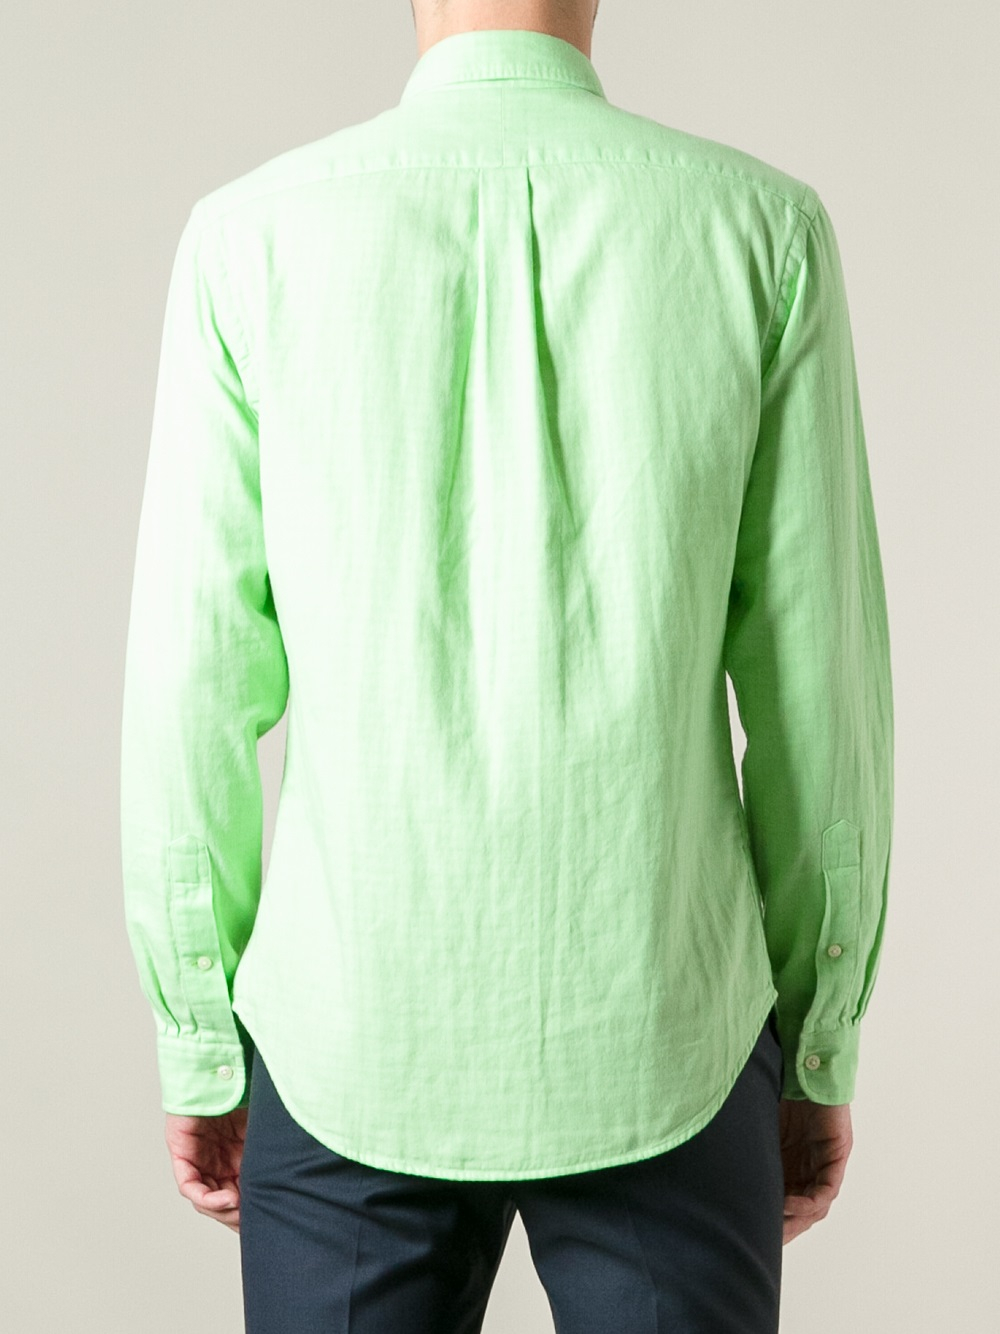 Polo ralph lauren button down shirt in green for men lyst for Polo ralph lauren casual button down shirts